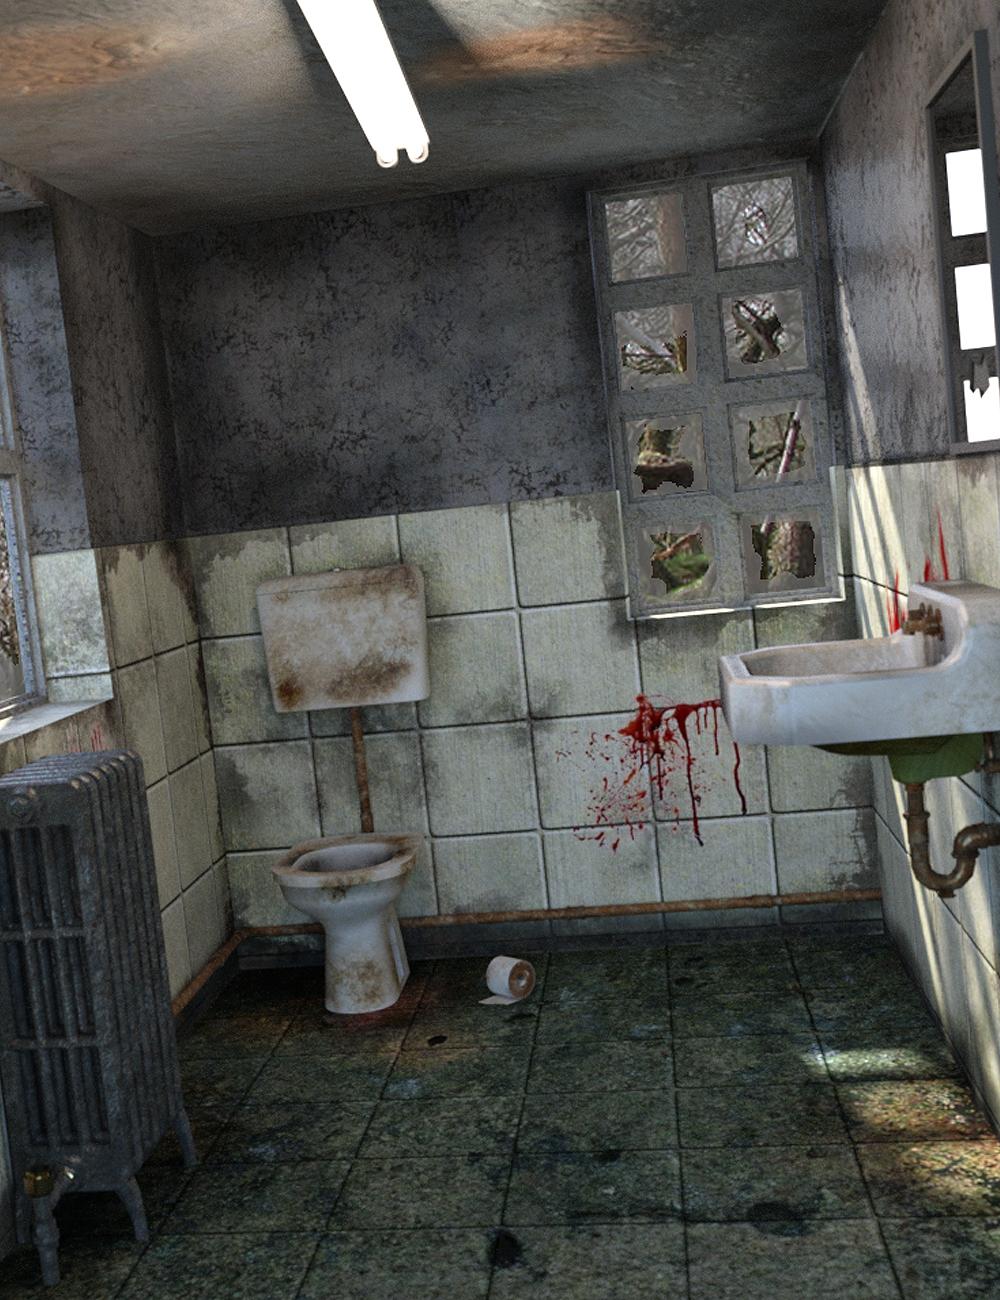 Abandoned Toilet by: Digitallab3D, 3D Models by Daz 3D